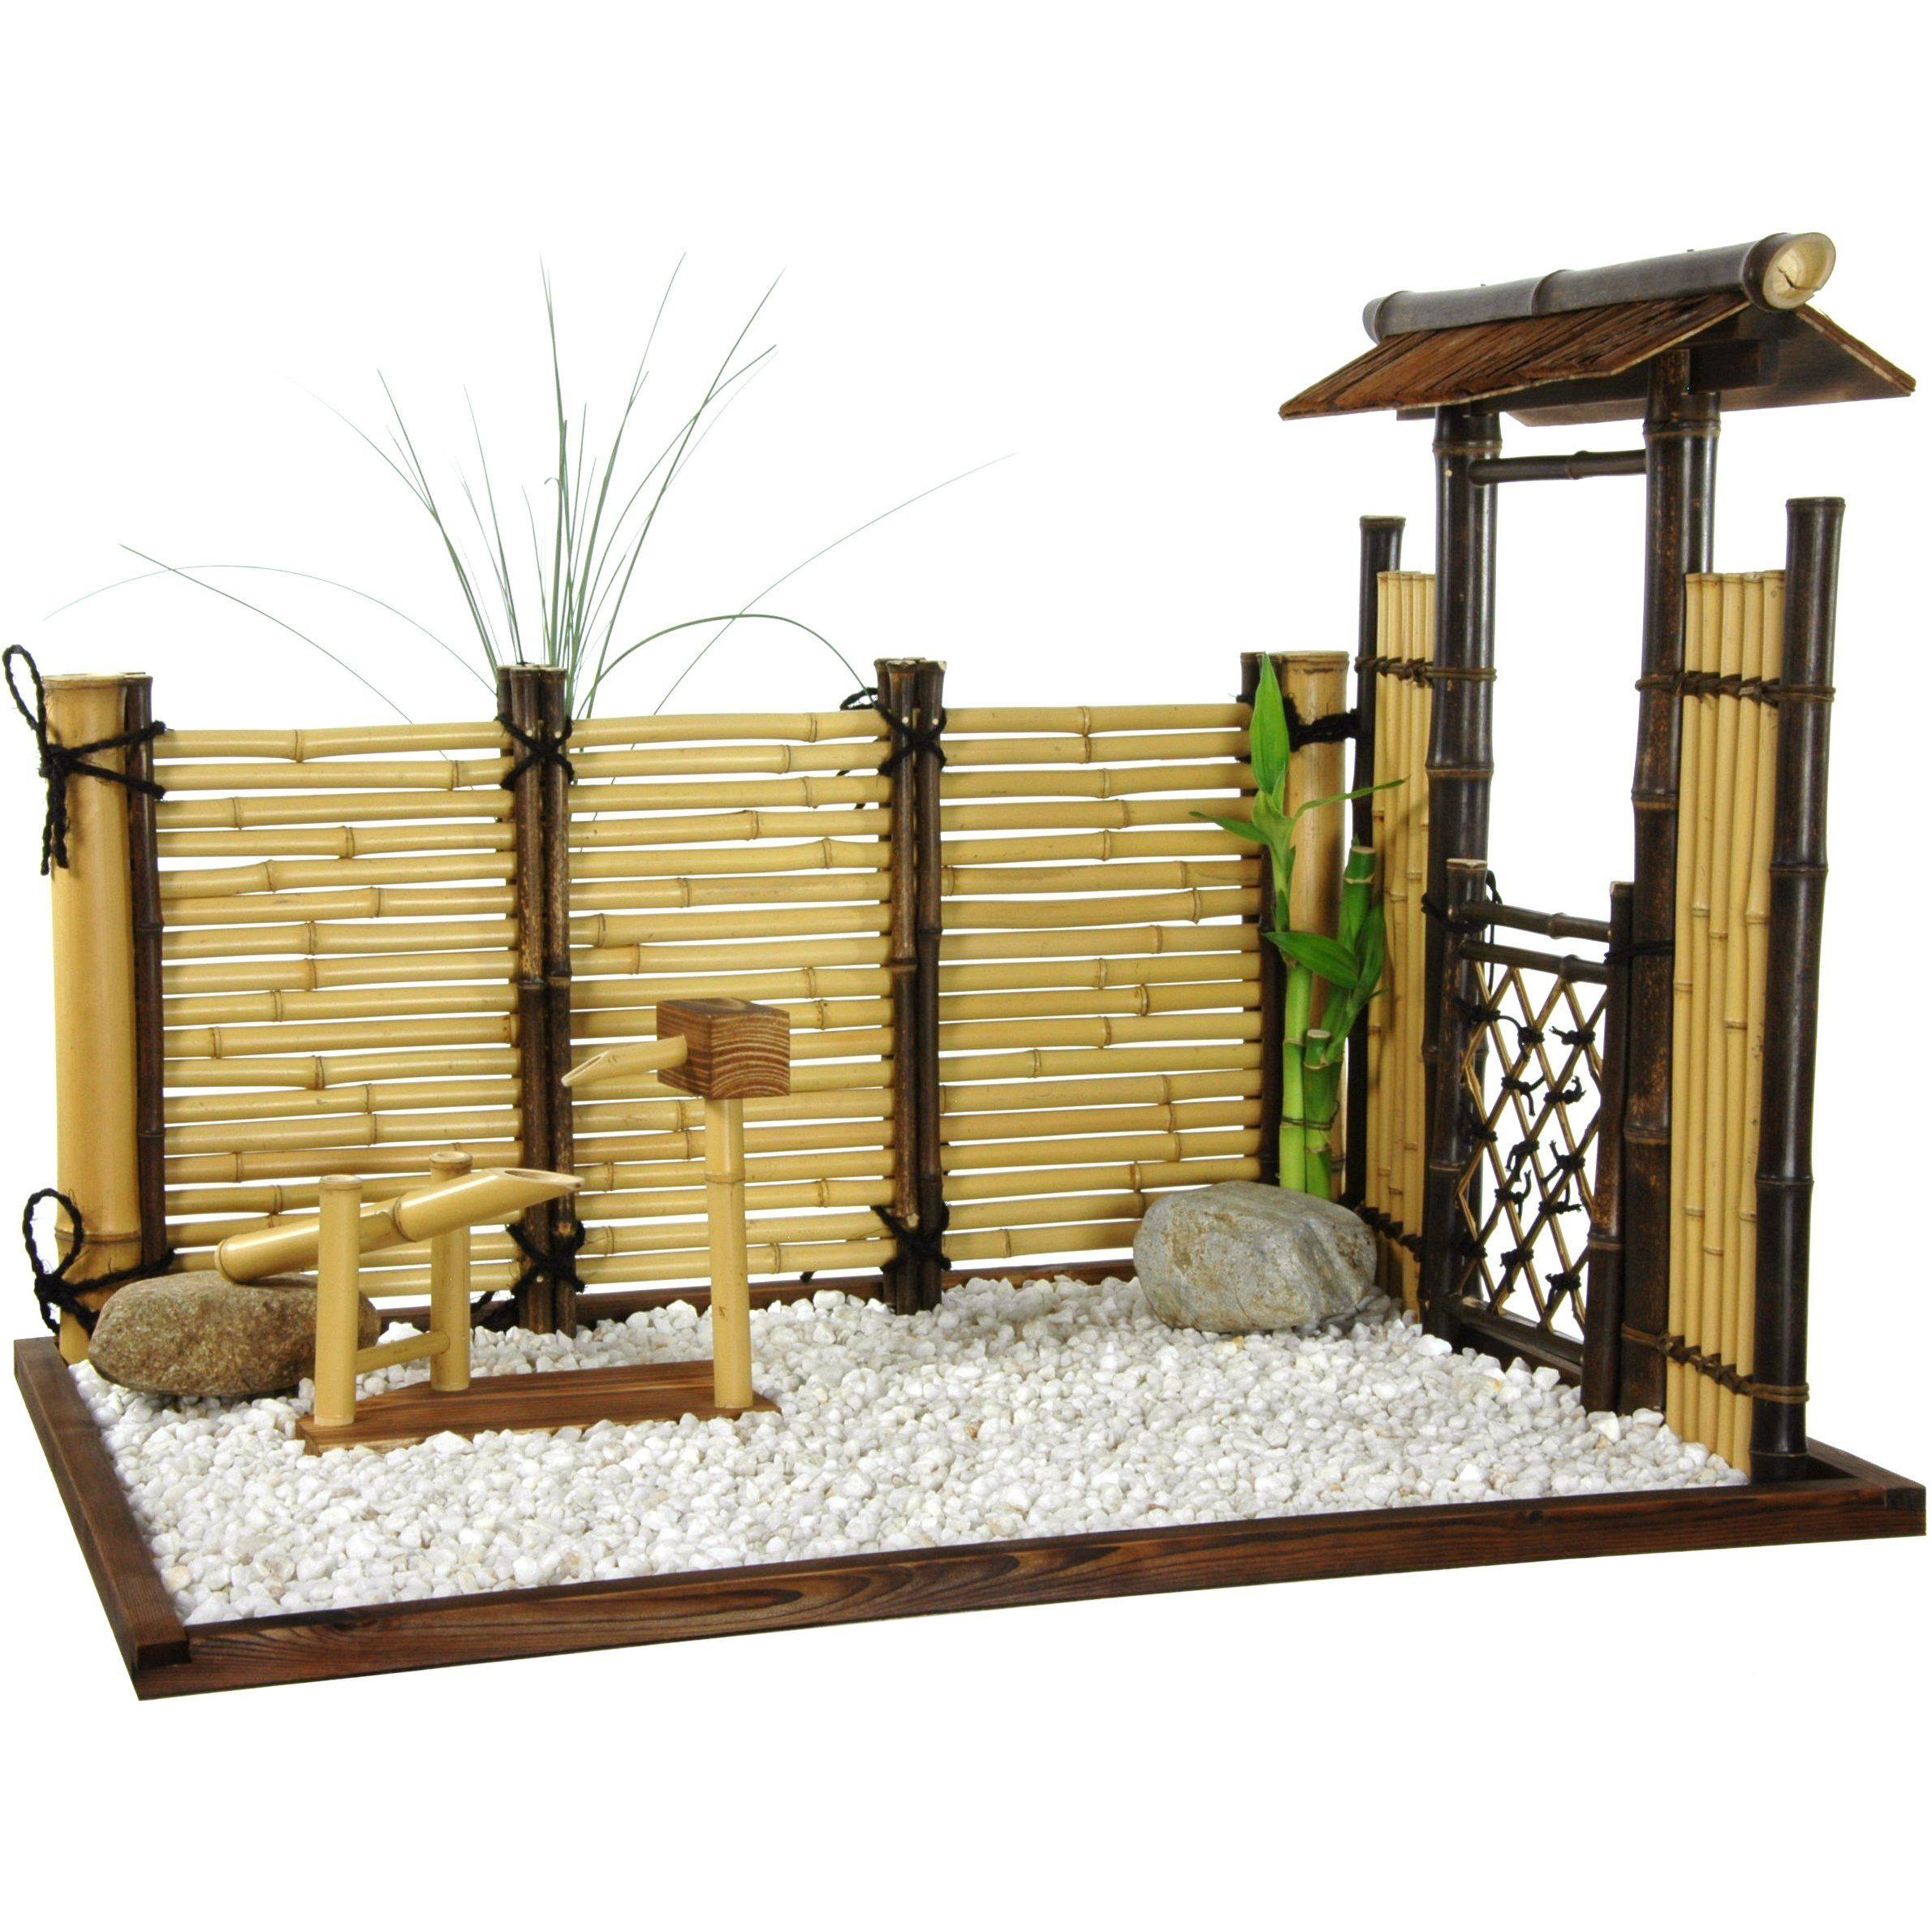 zen mini garden oriental furniture oriental and minis. Black Bedroom Furniture Sets. Home Design Ideas